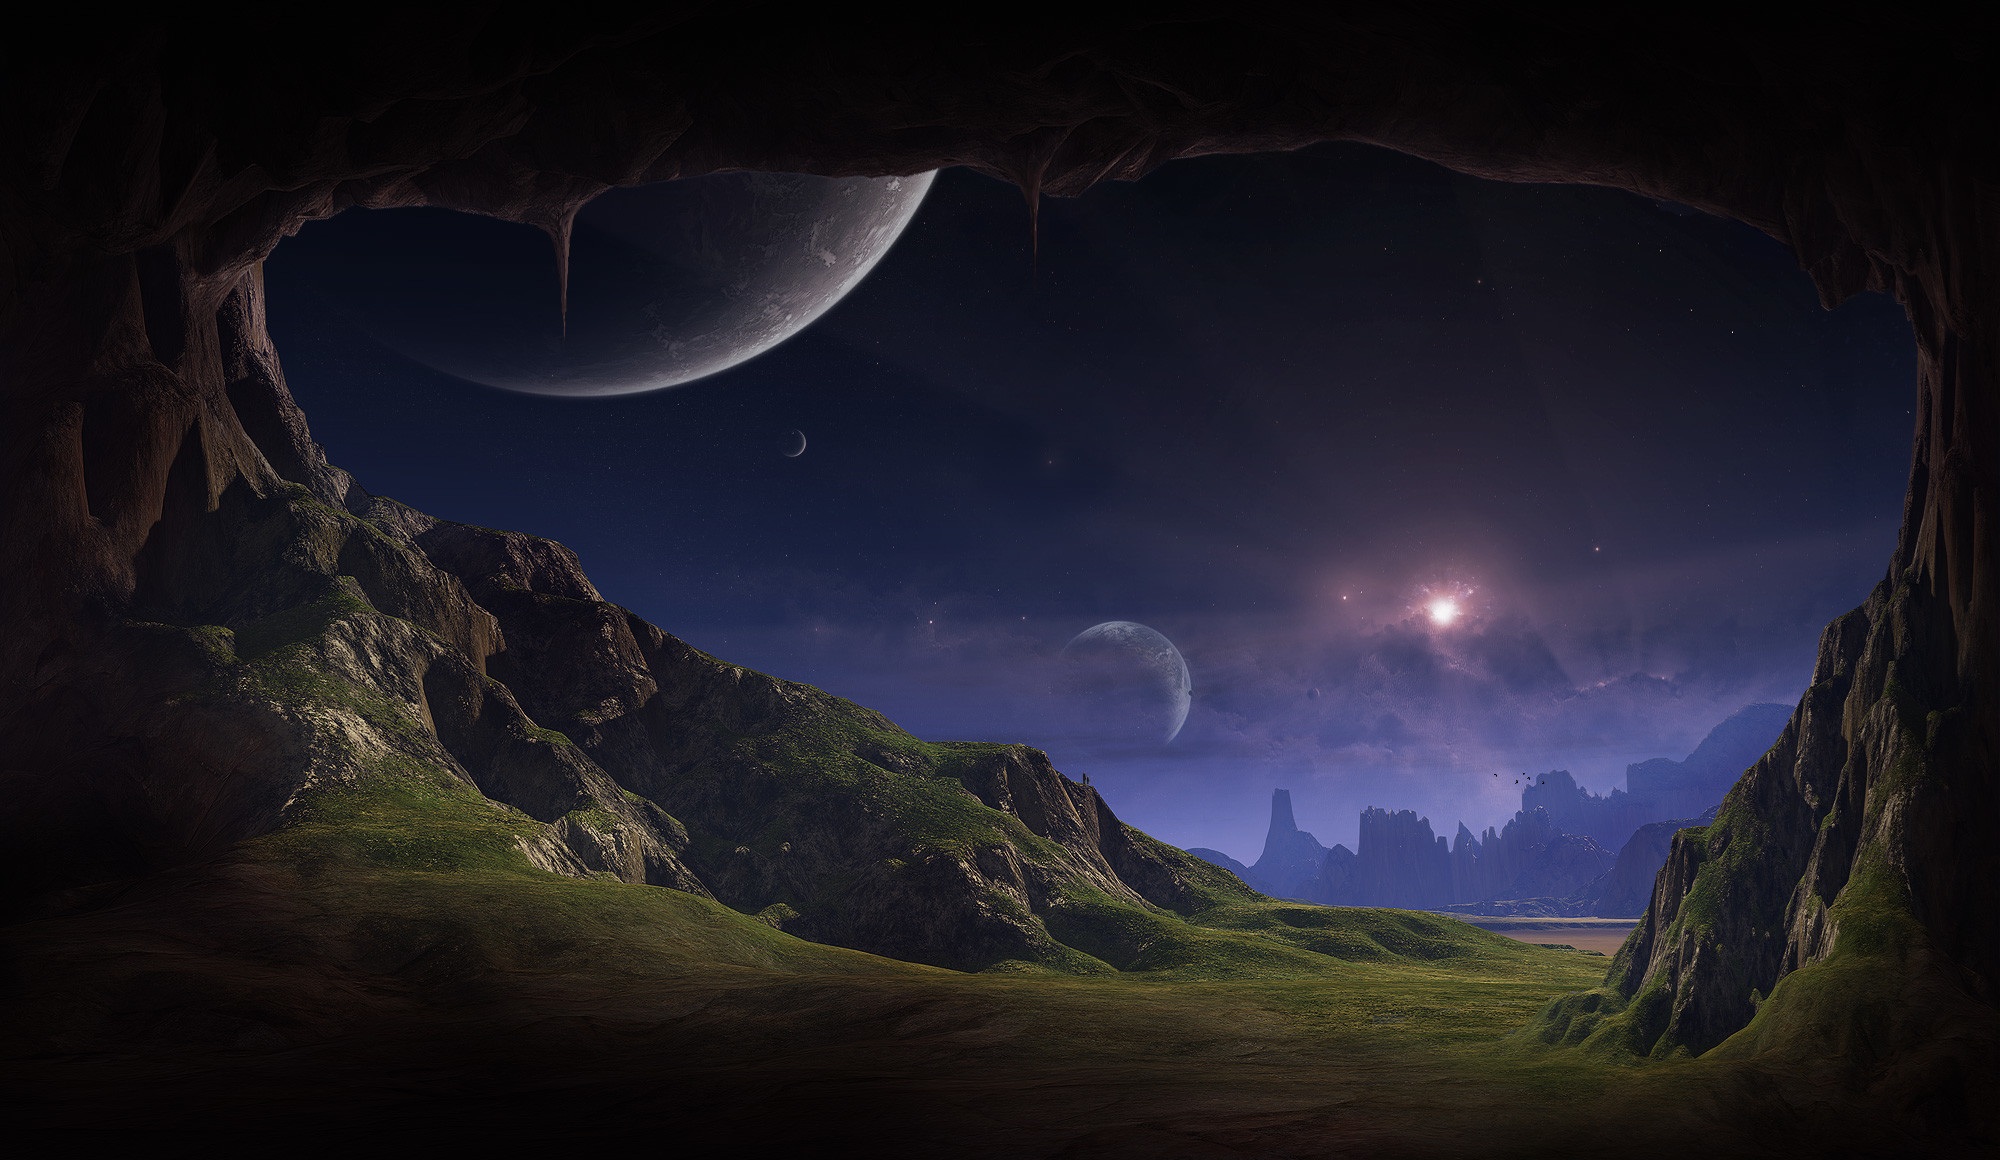 Science Fiction Landscape 6 Digital Art Resolution – For Widescreen  Monitors & Laptops